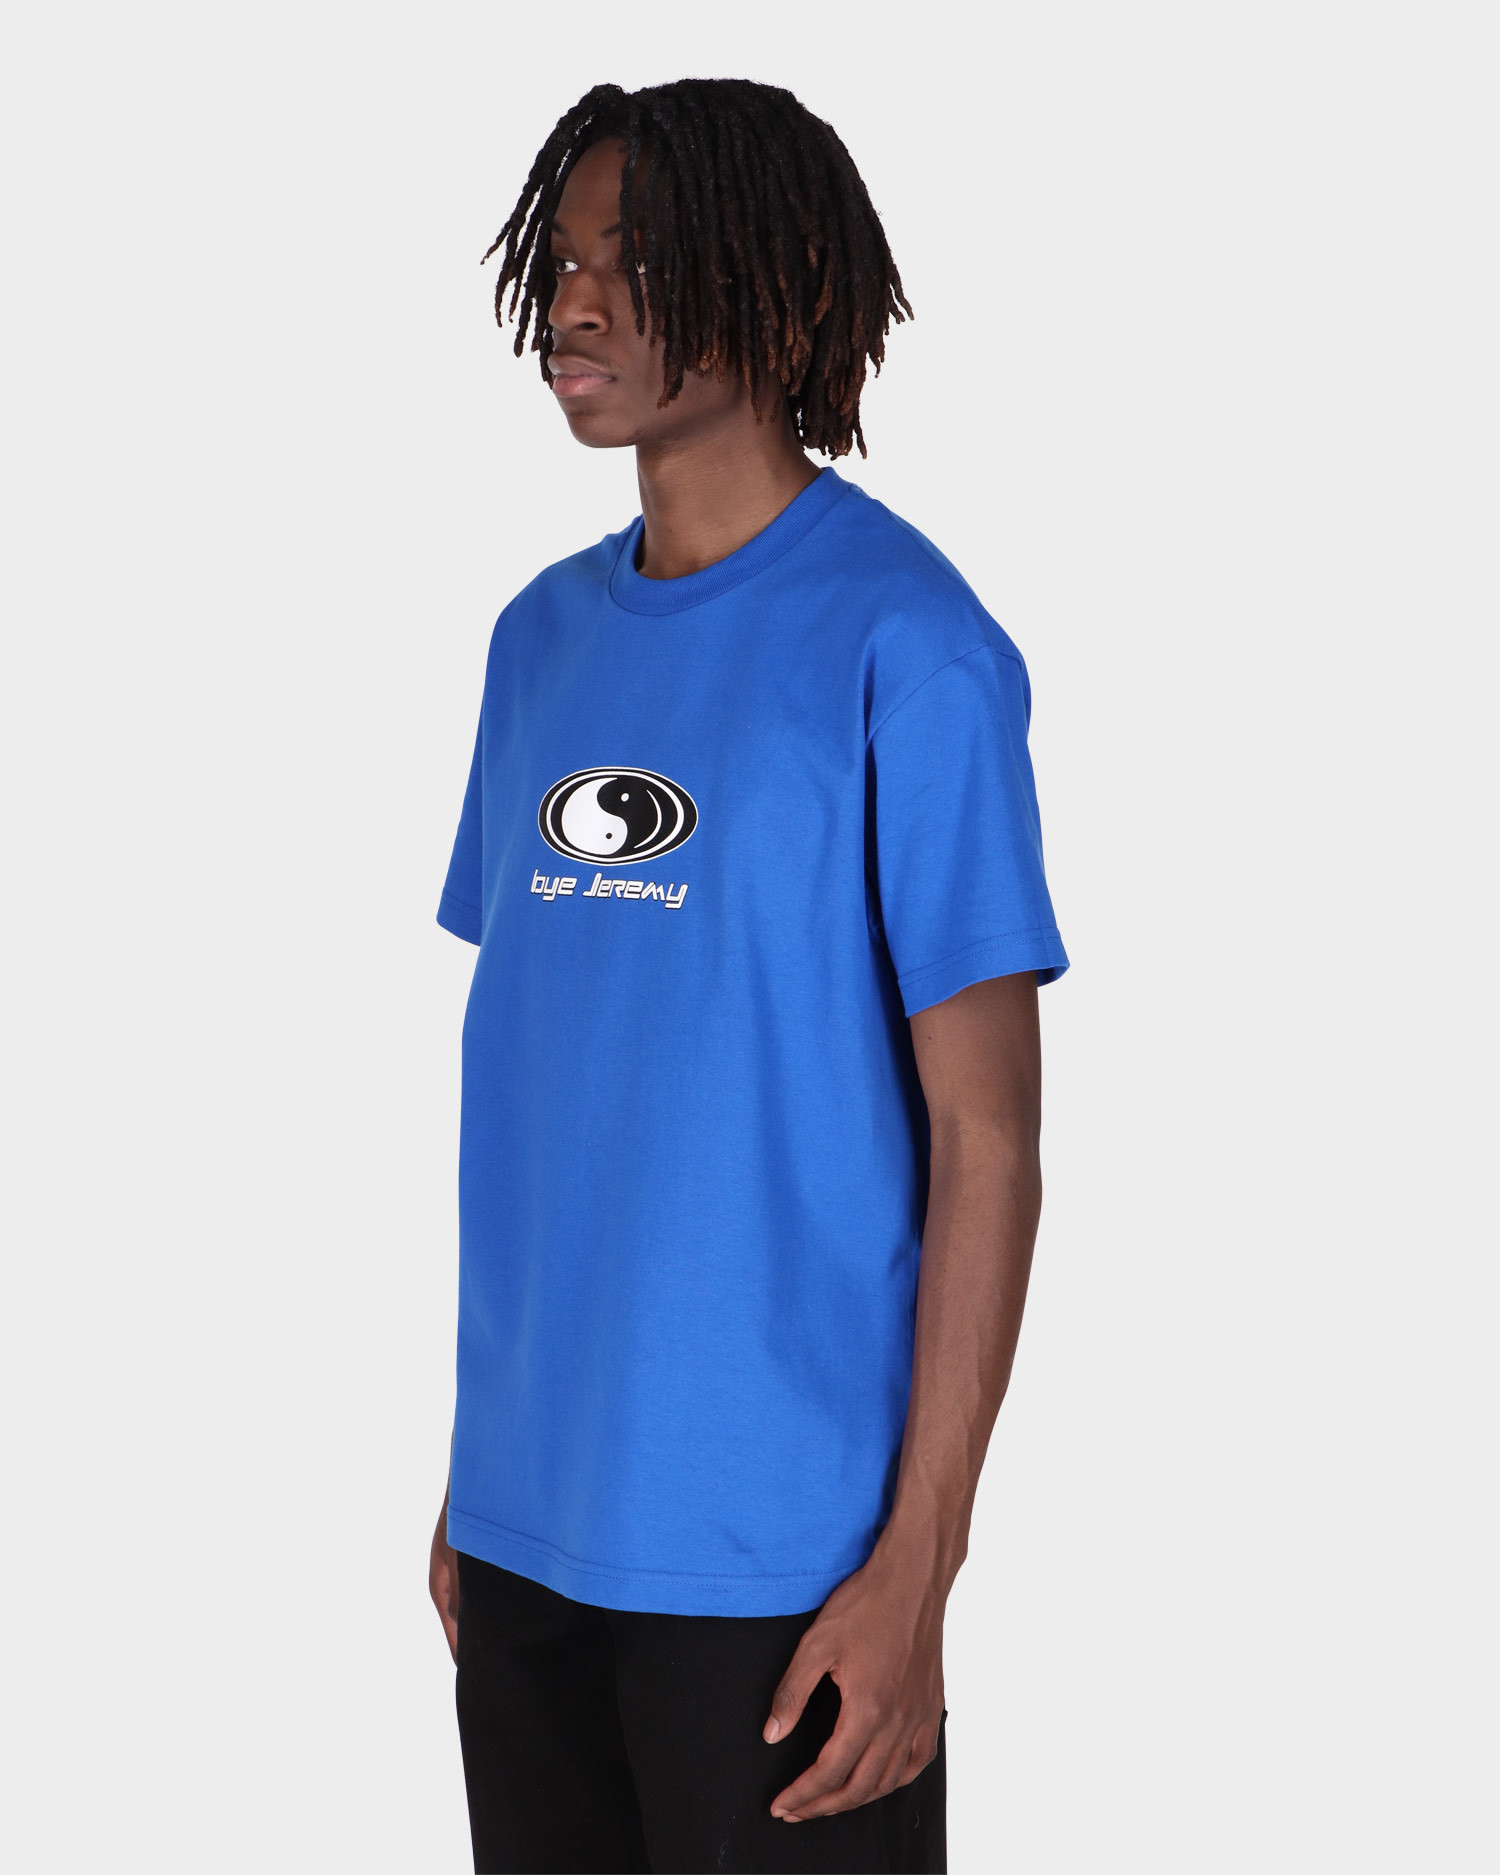 Bye Jeremy Royal Blue Ying Yang T-shirt